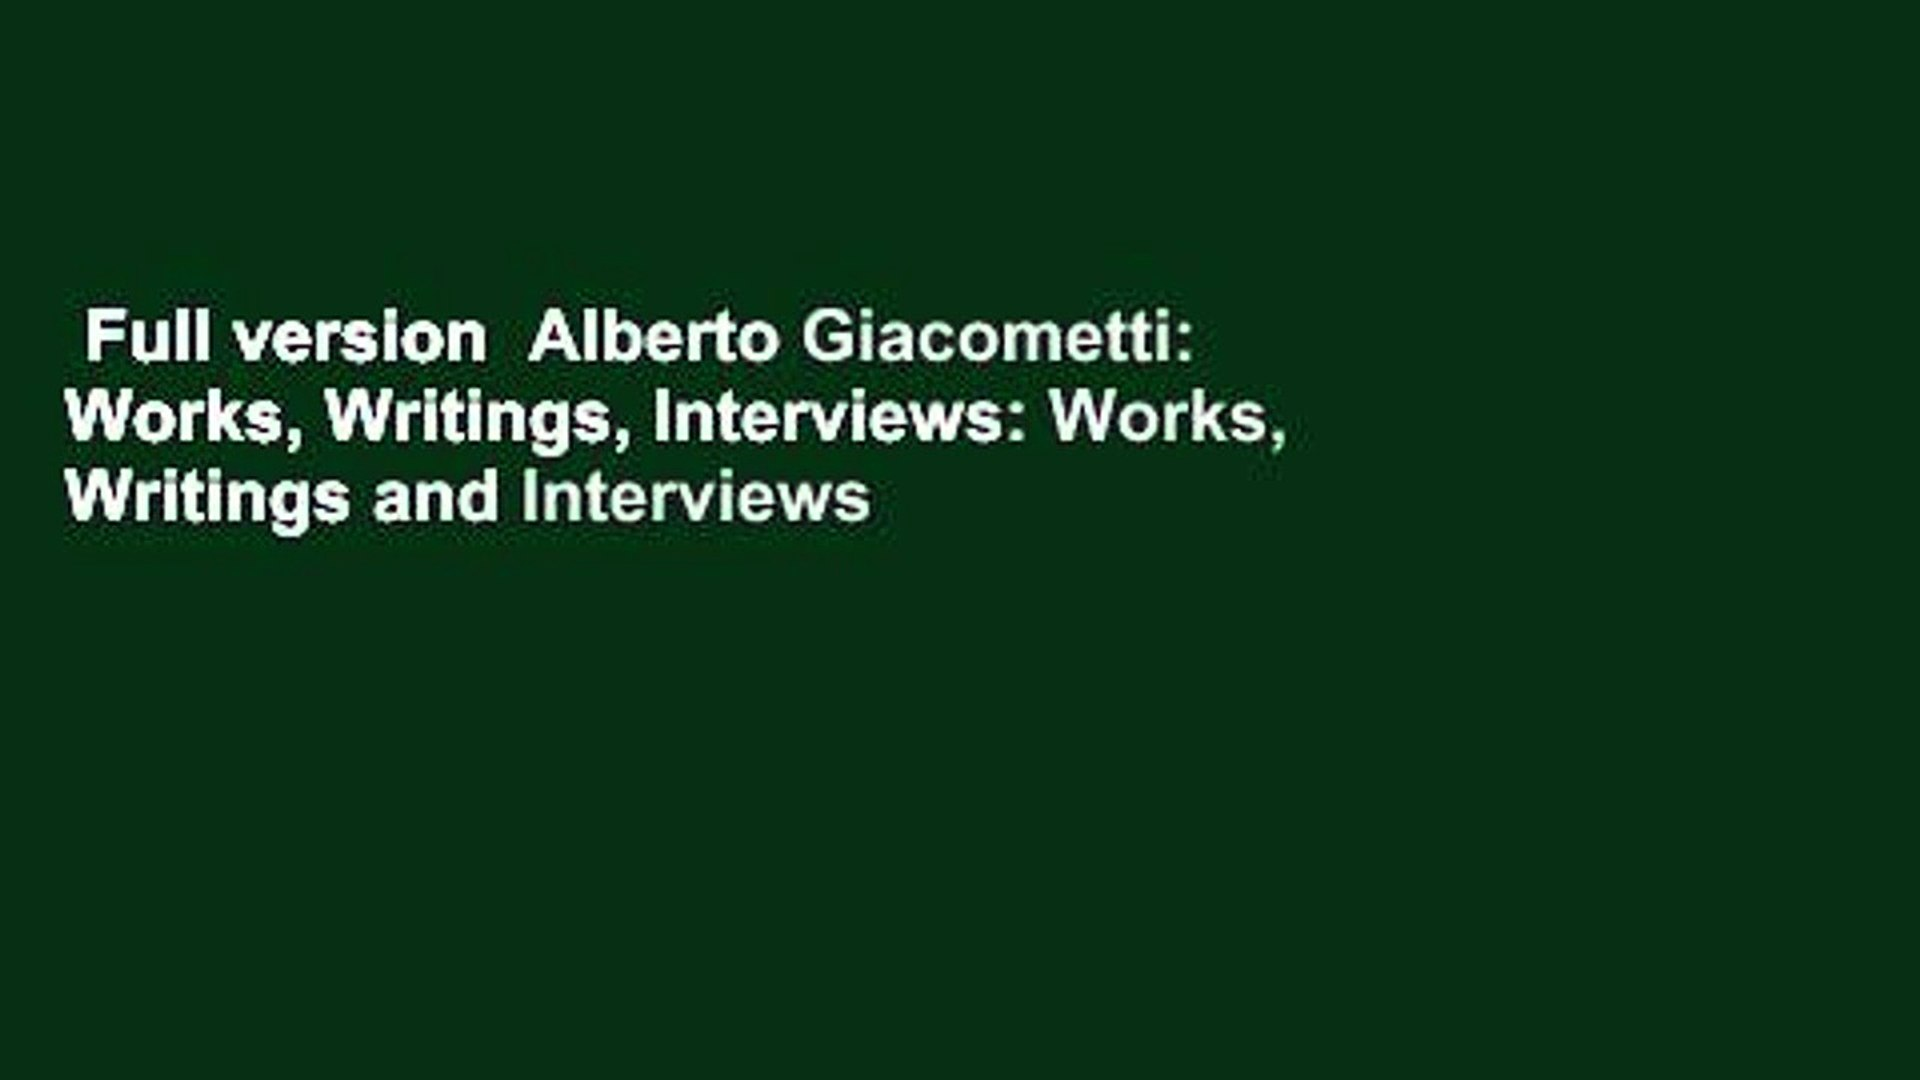 Full version  Alberto Giacometti: Works, Writings, Interviews: Works, Writings and Interviews